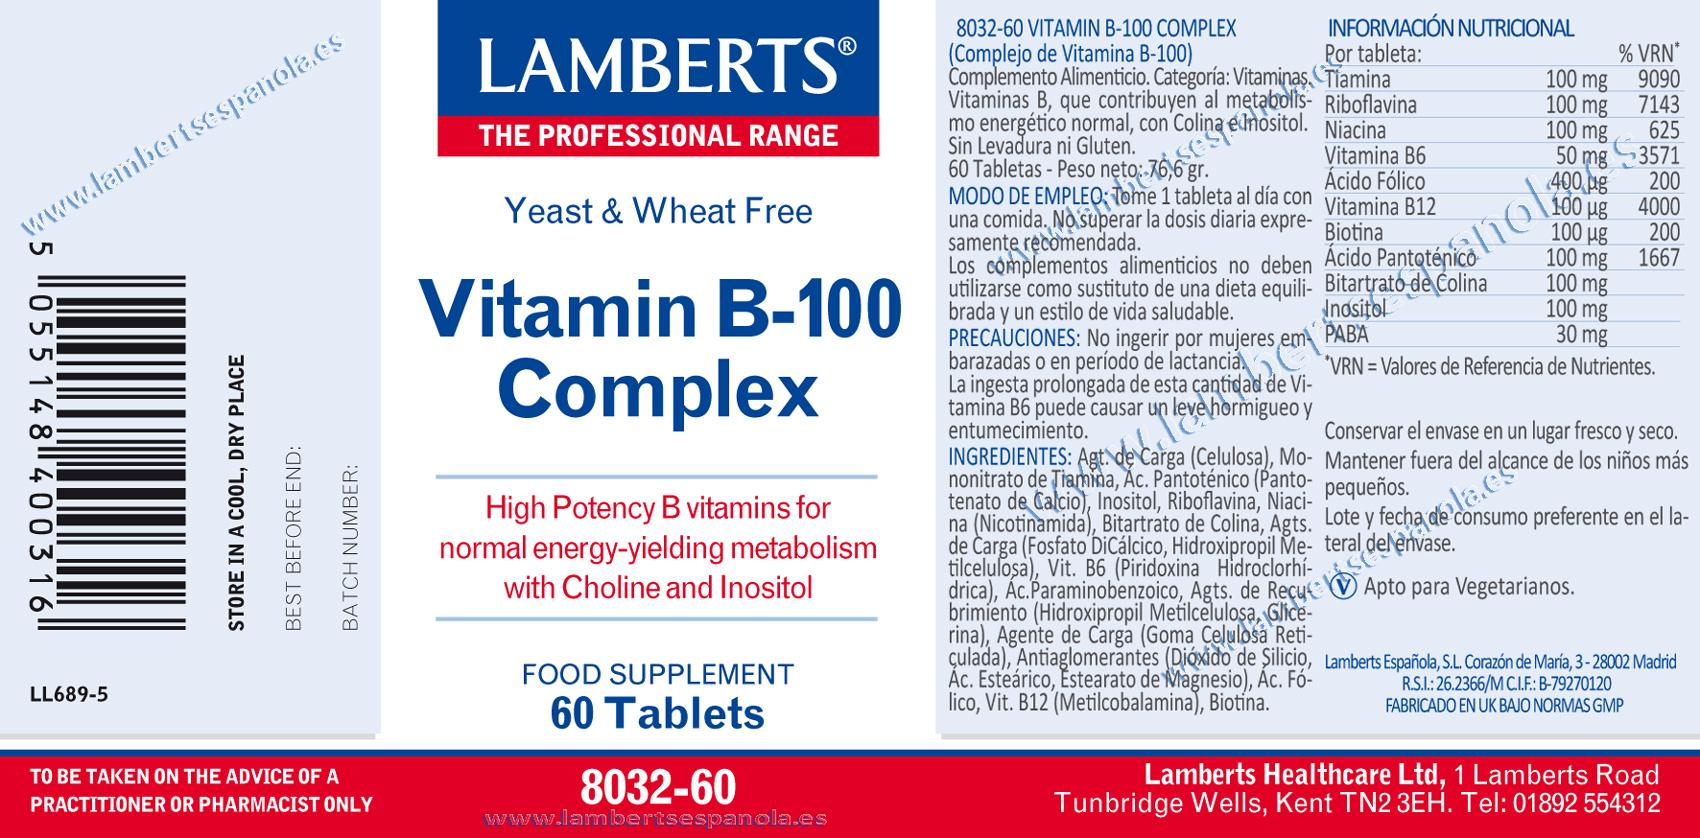 Vitamina del grupo B